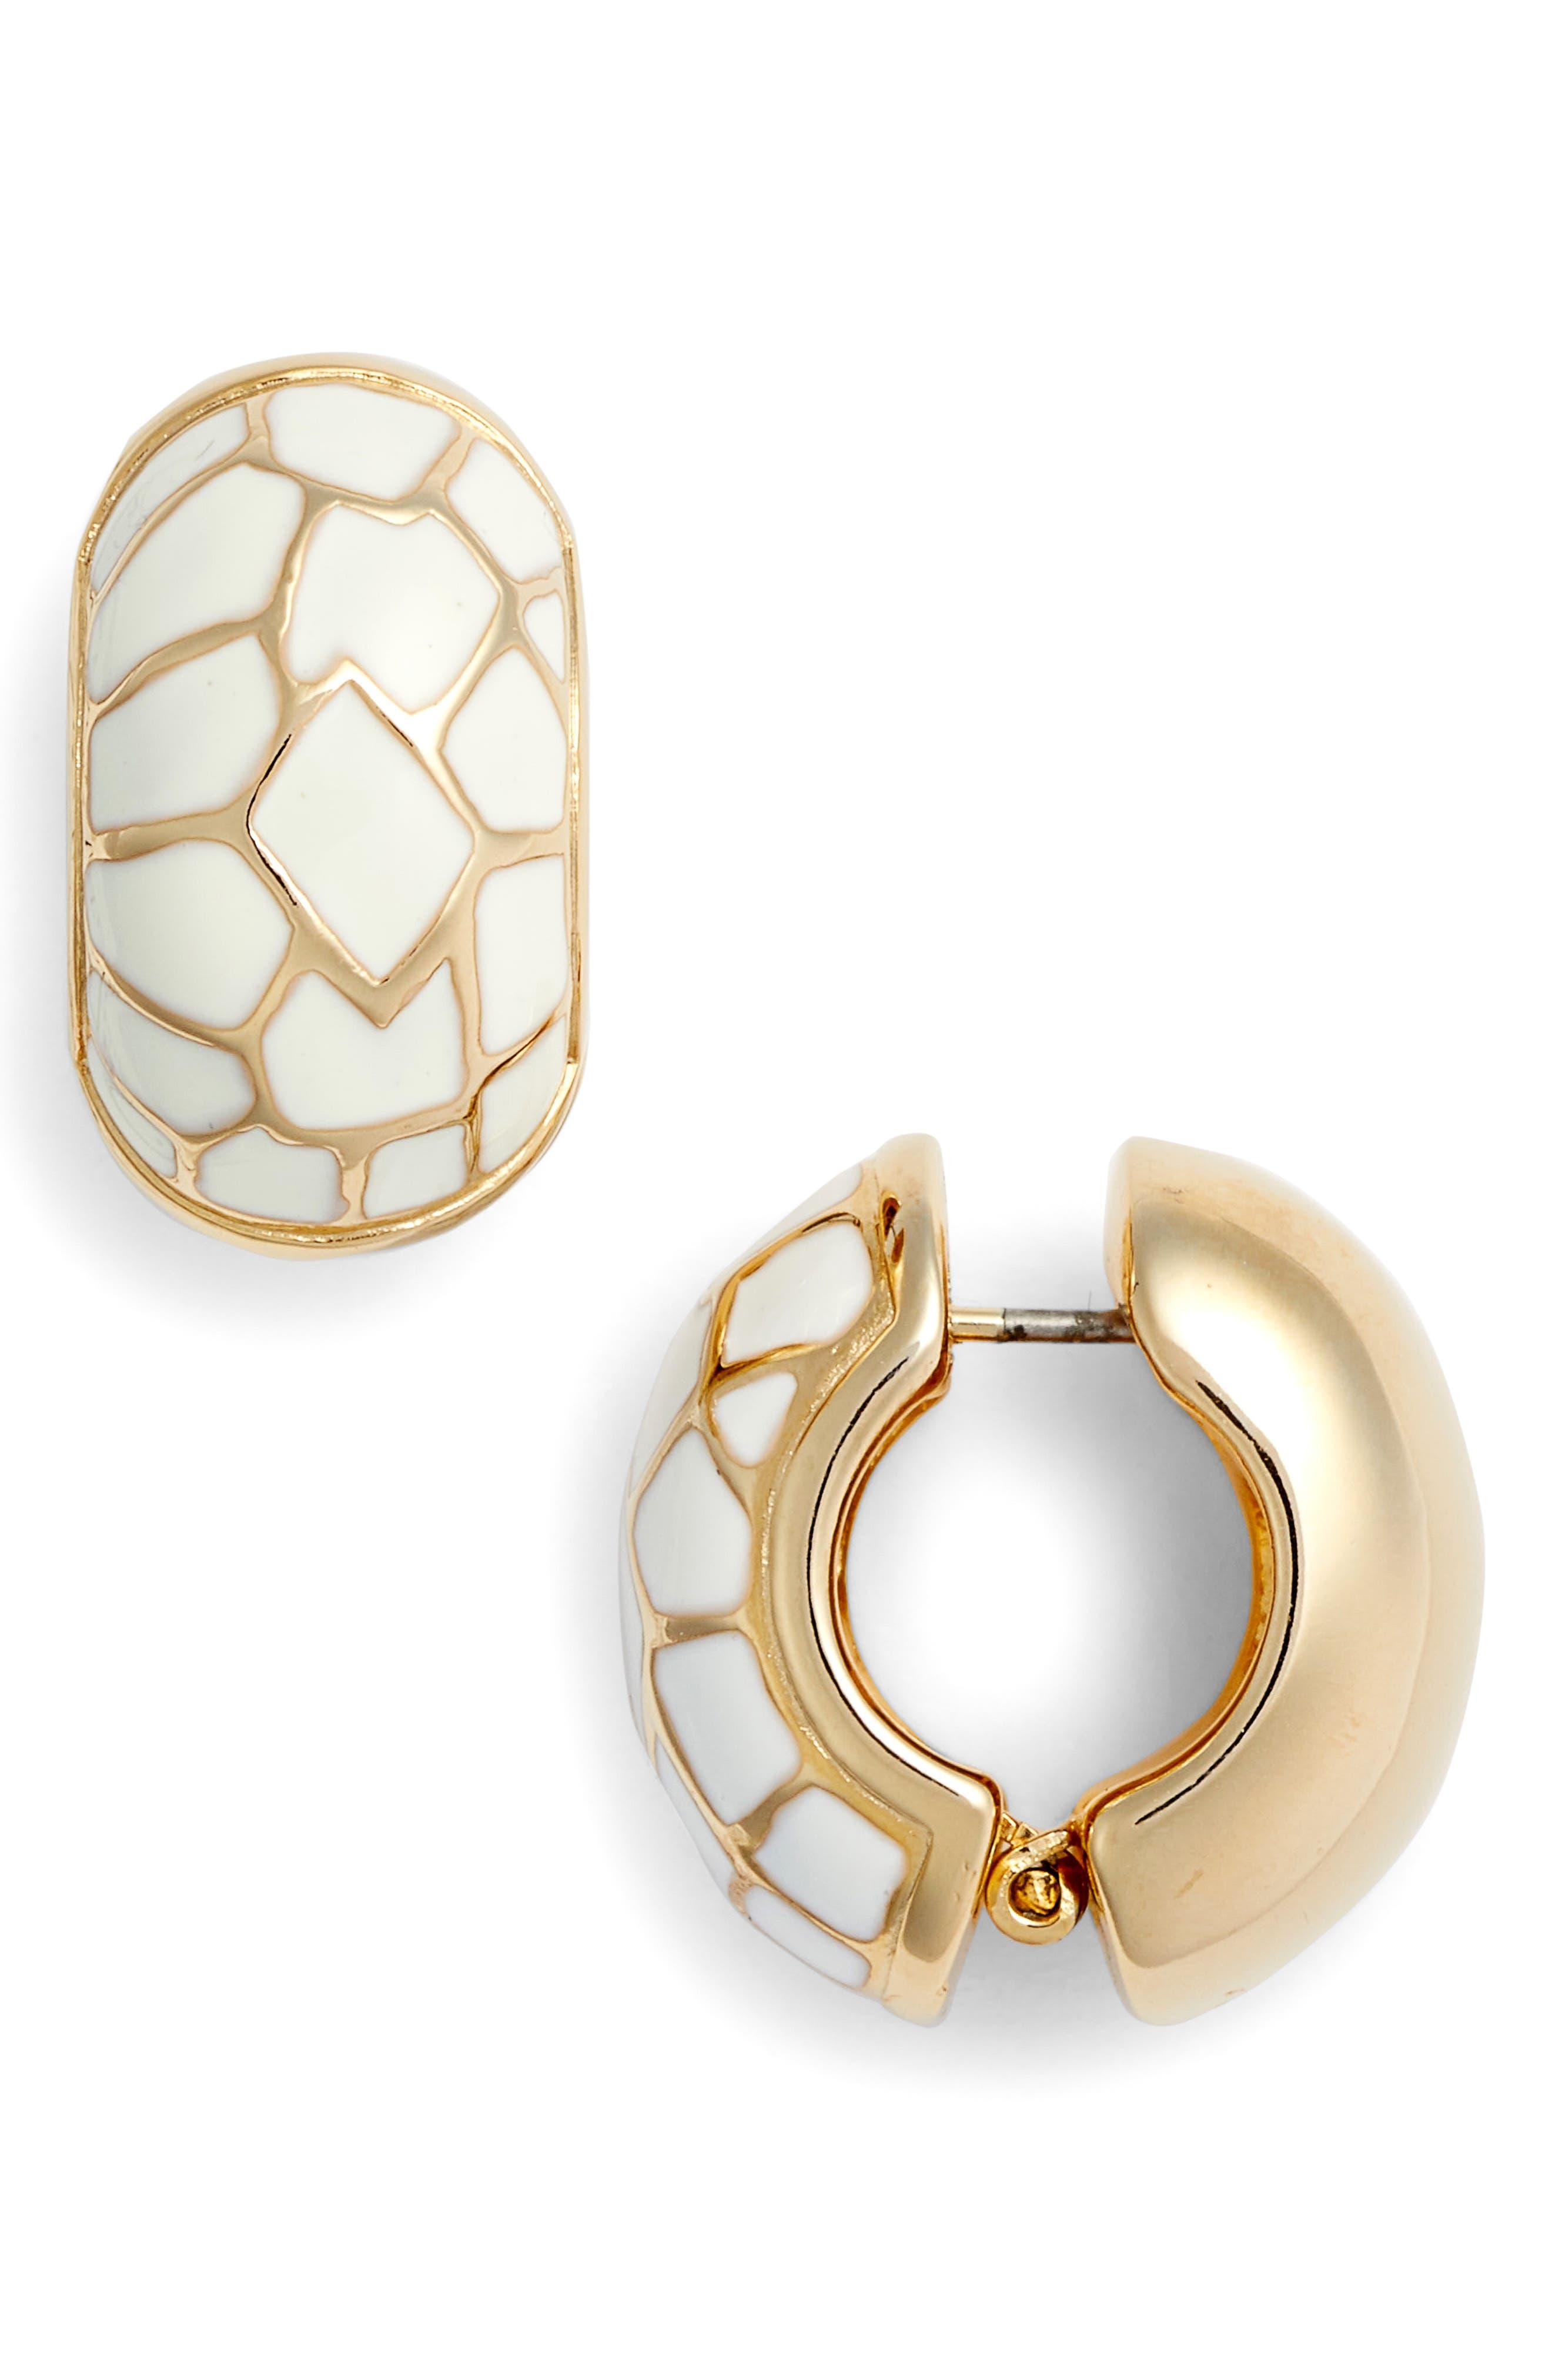 White Cobblestone Earrings,                             Main thumbnail 1, color,                             WHITE